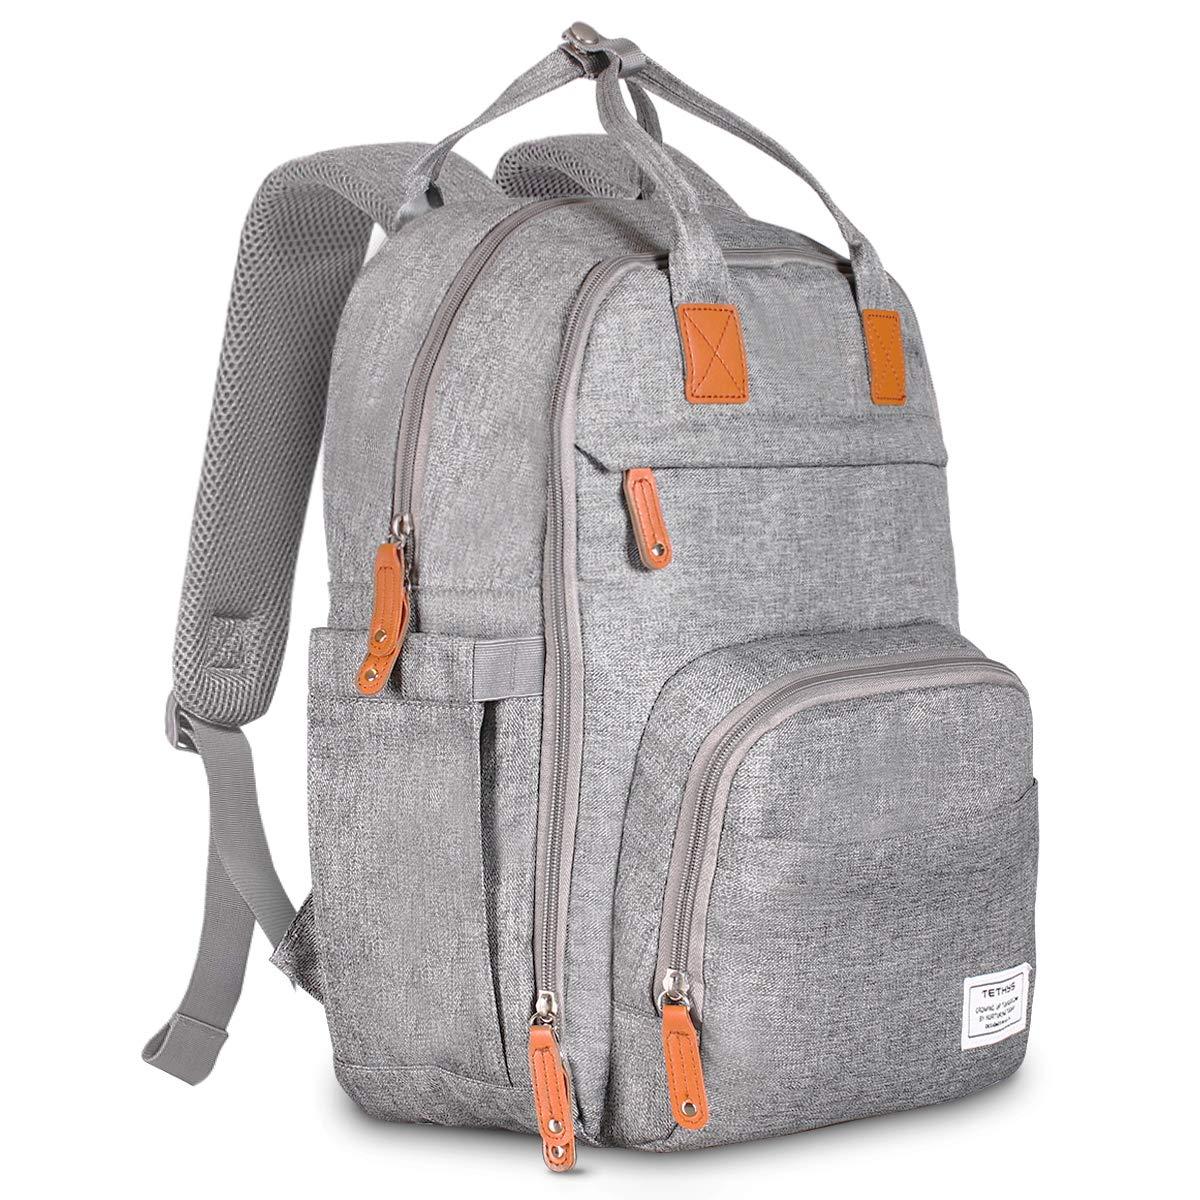 Backpack Multifunction Waterproof Maternity Organizer